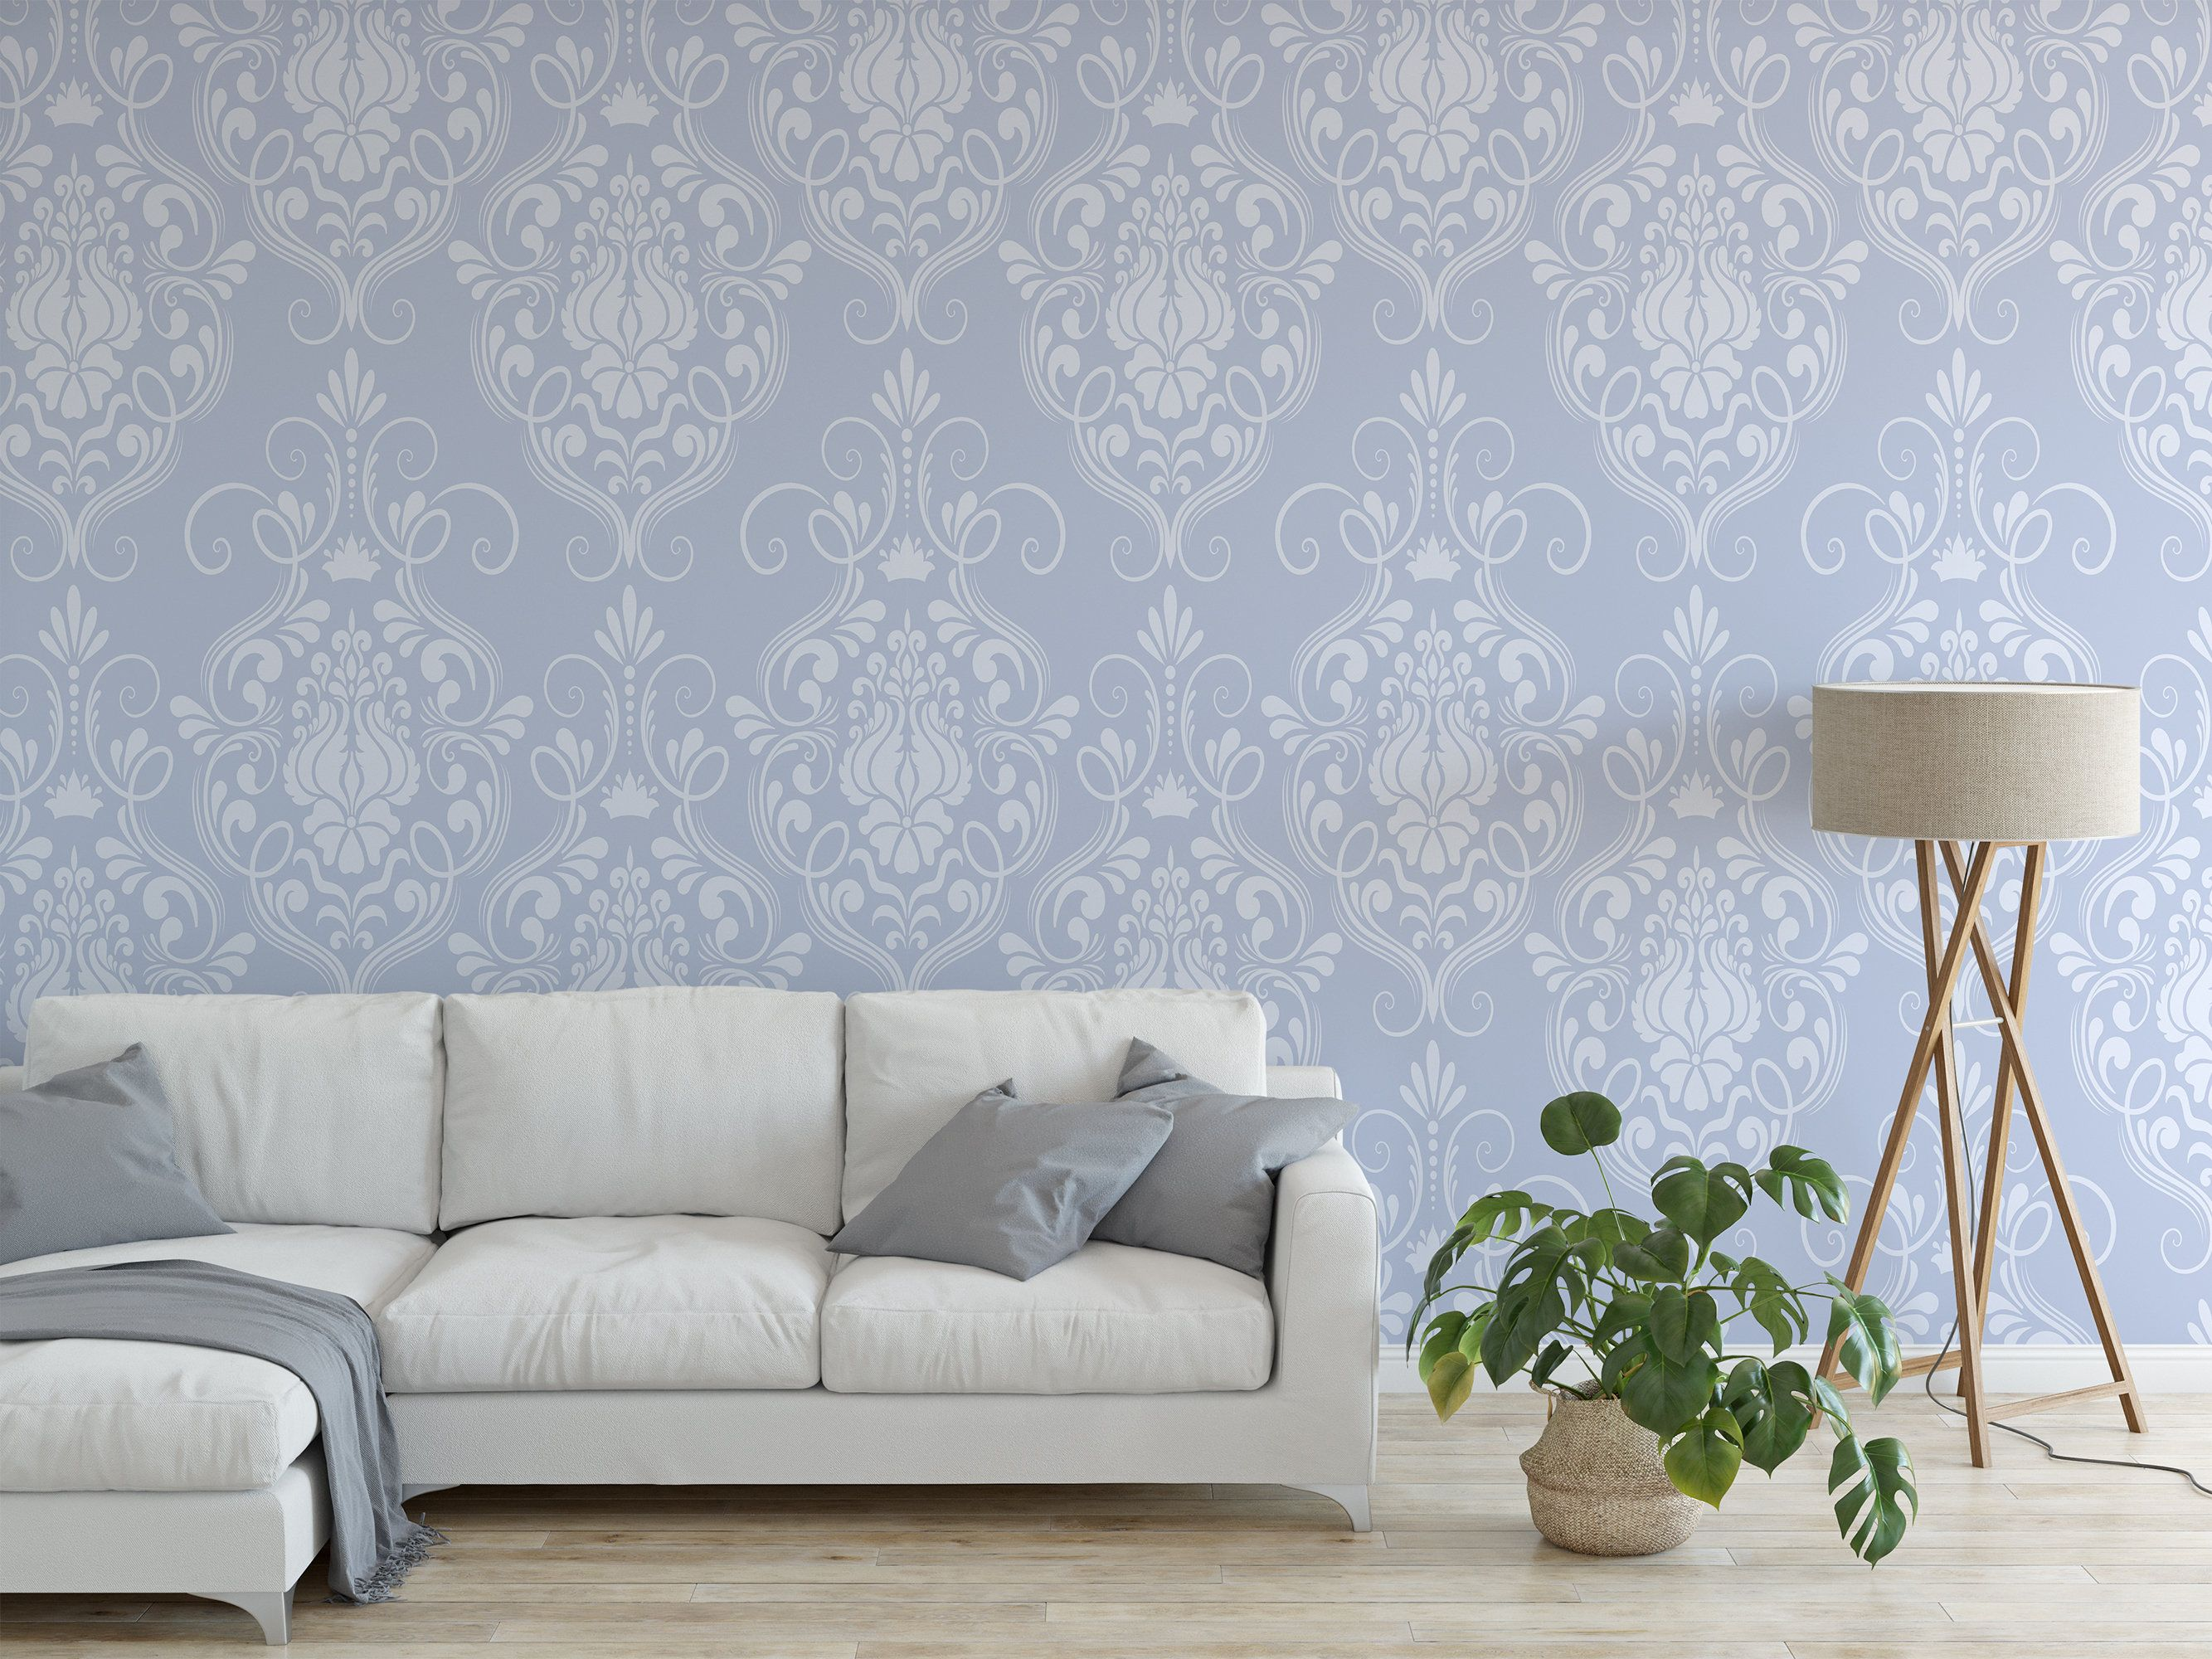 Removable Peel And Stick Wallpaper Elegant Blue Damask Etsy Vinyl Wallpaper Damask Wallpaper Peel And Stick Wallpaper